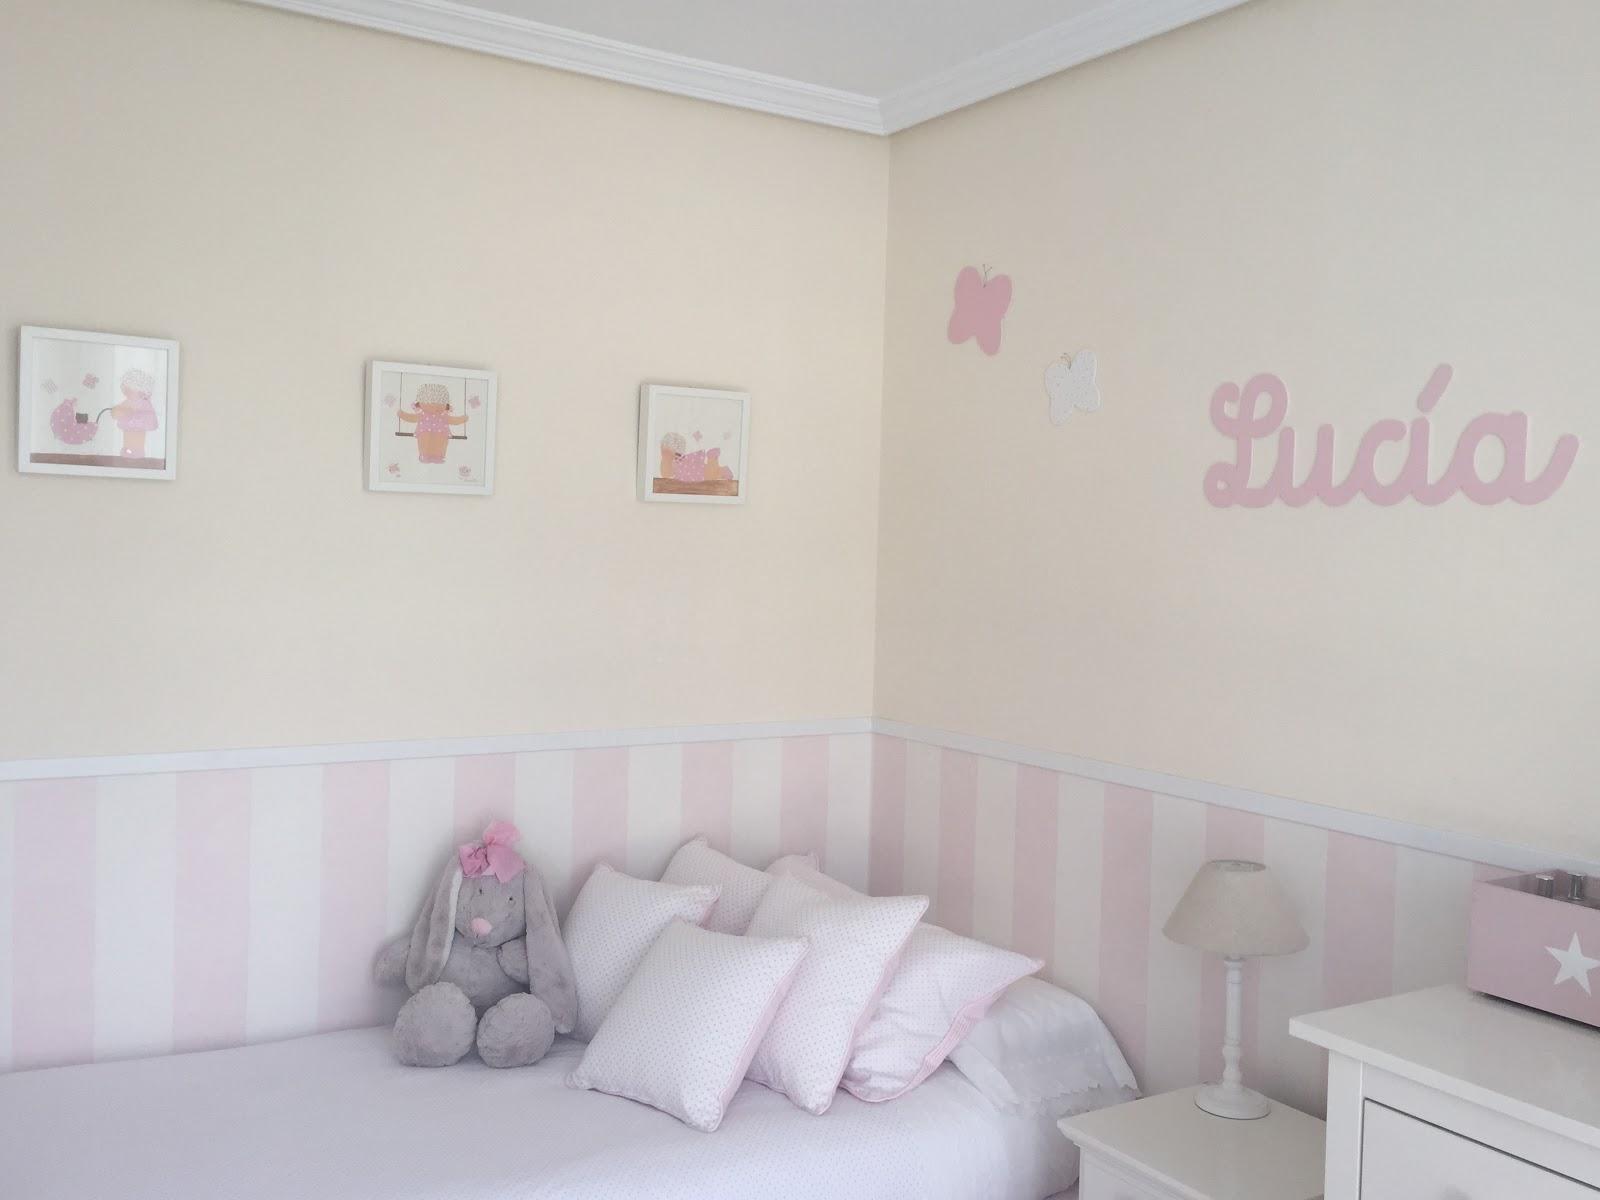 letras y nombres infantiles para decorar Decoraci n infantil